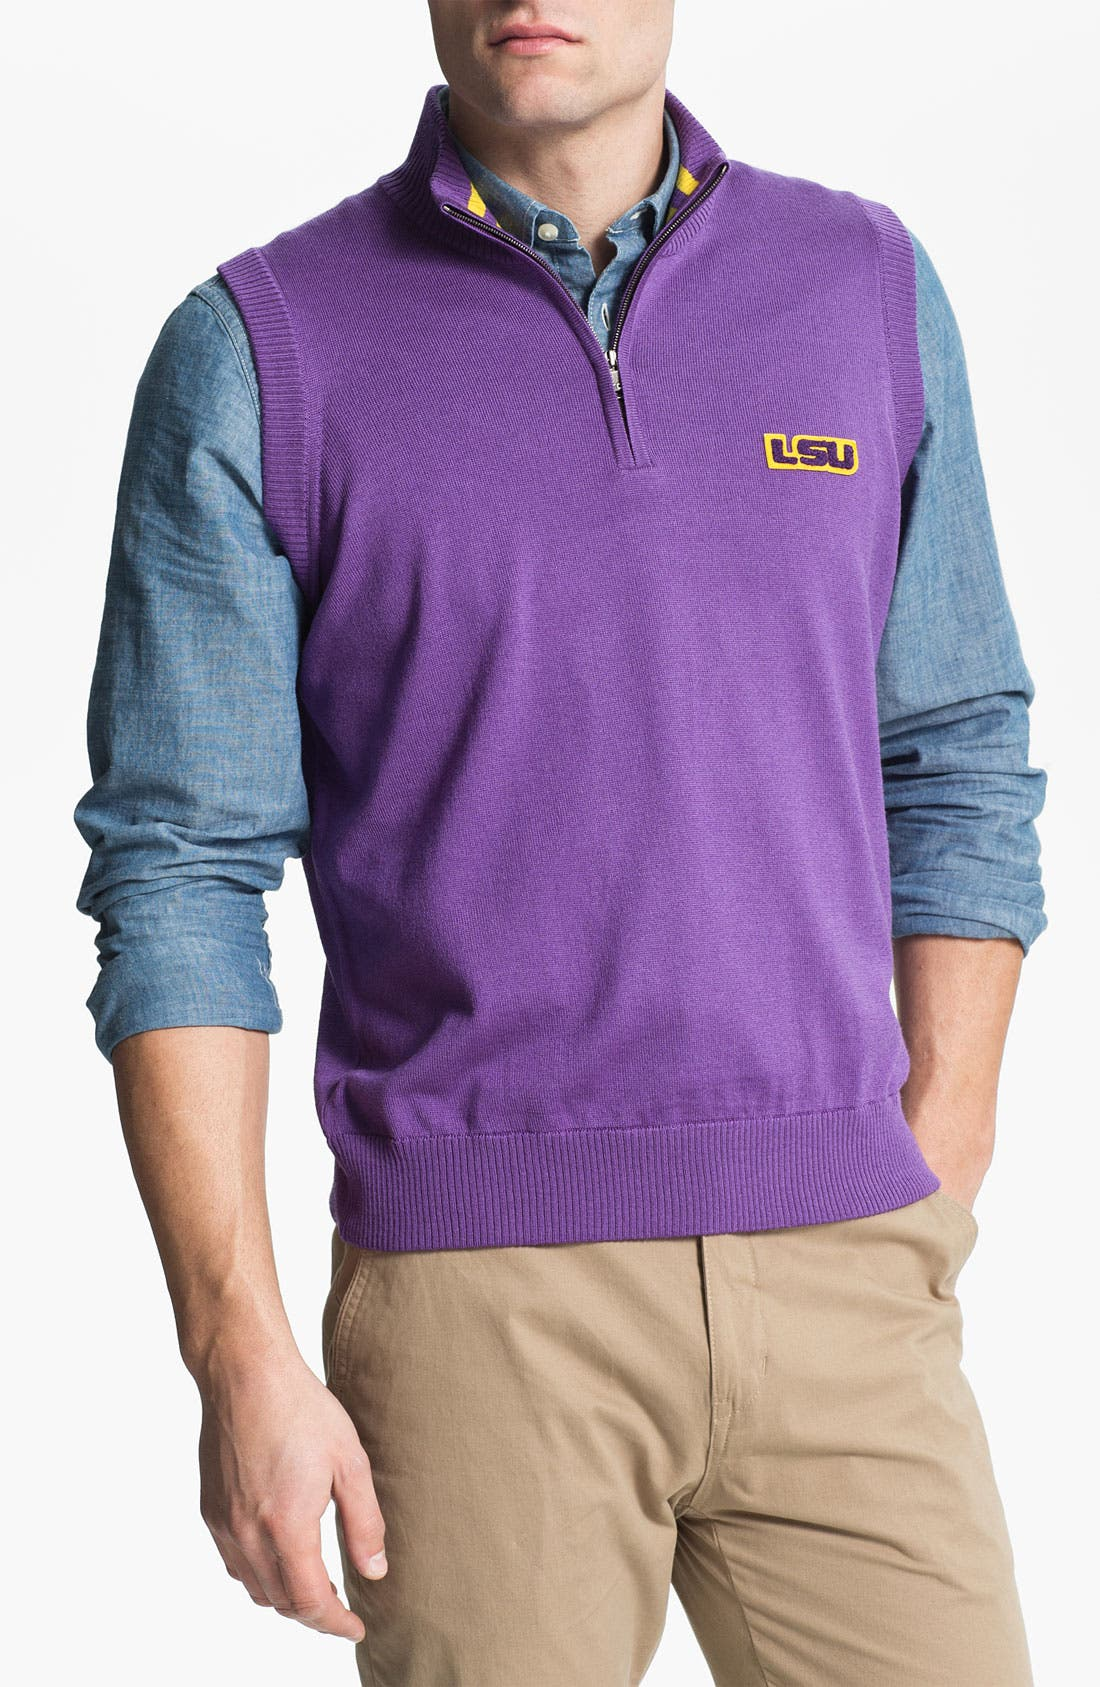 Main Image - Thomas Dean 'Louisiana State University' Quarter Zip Sweater Vest